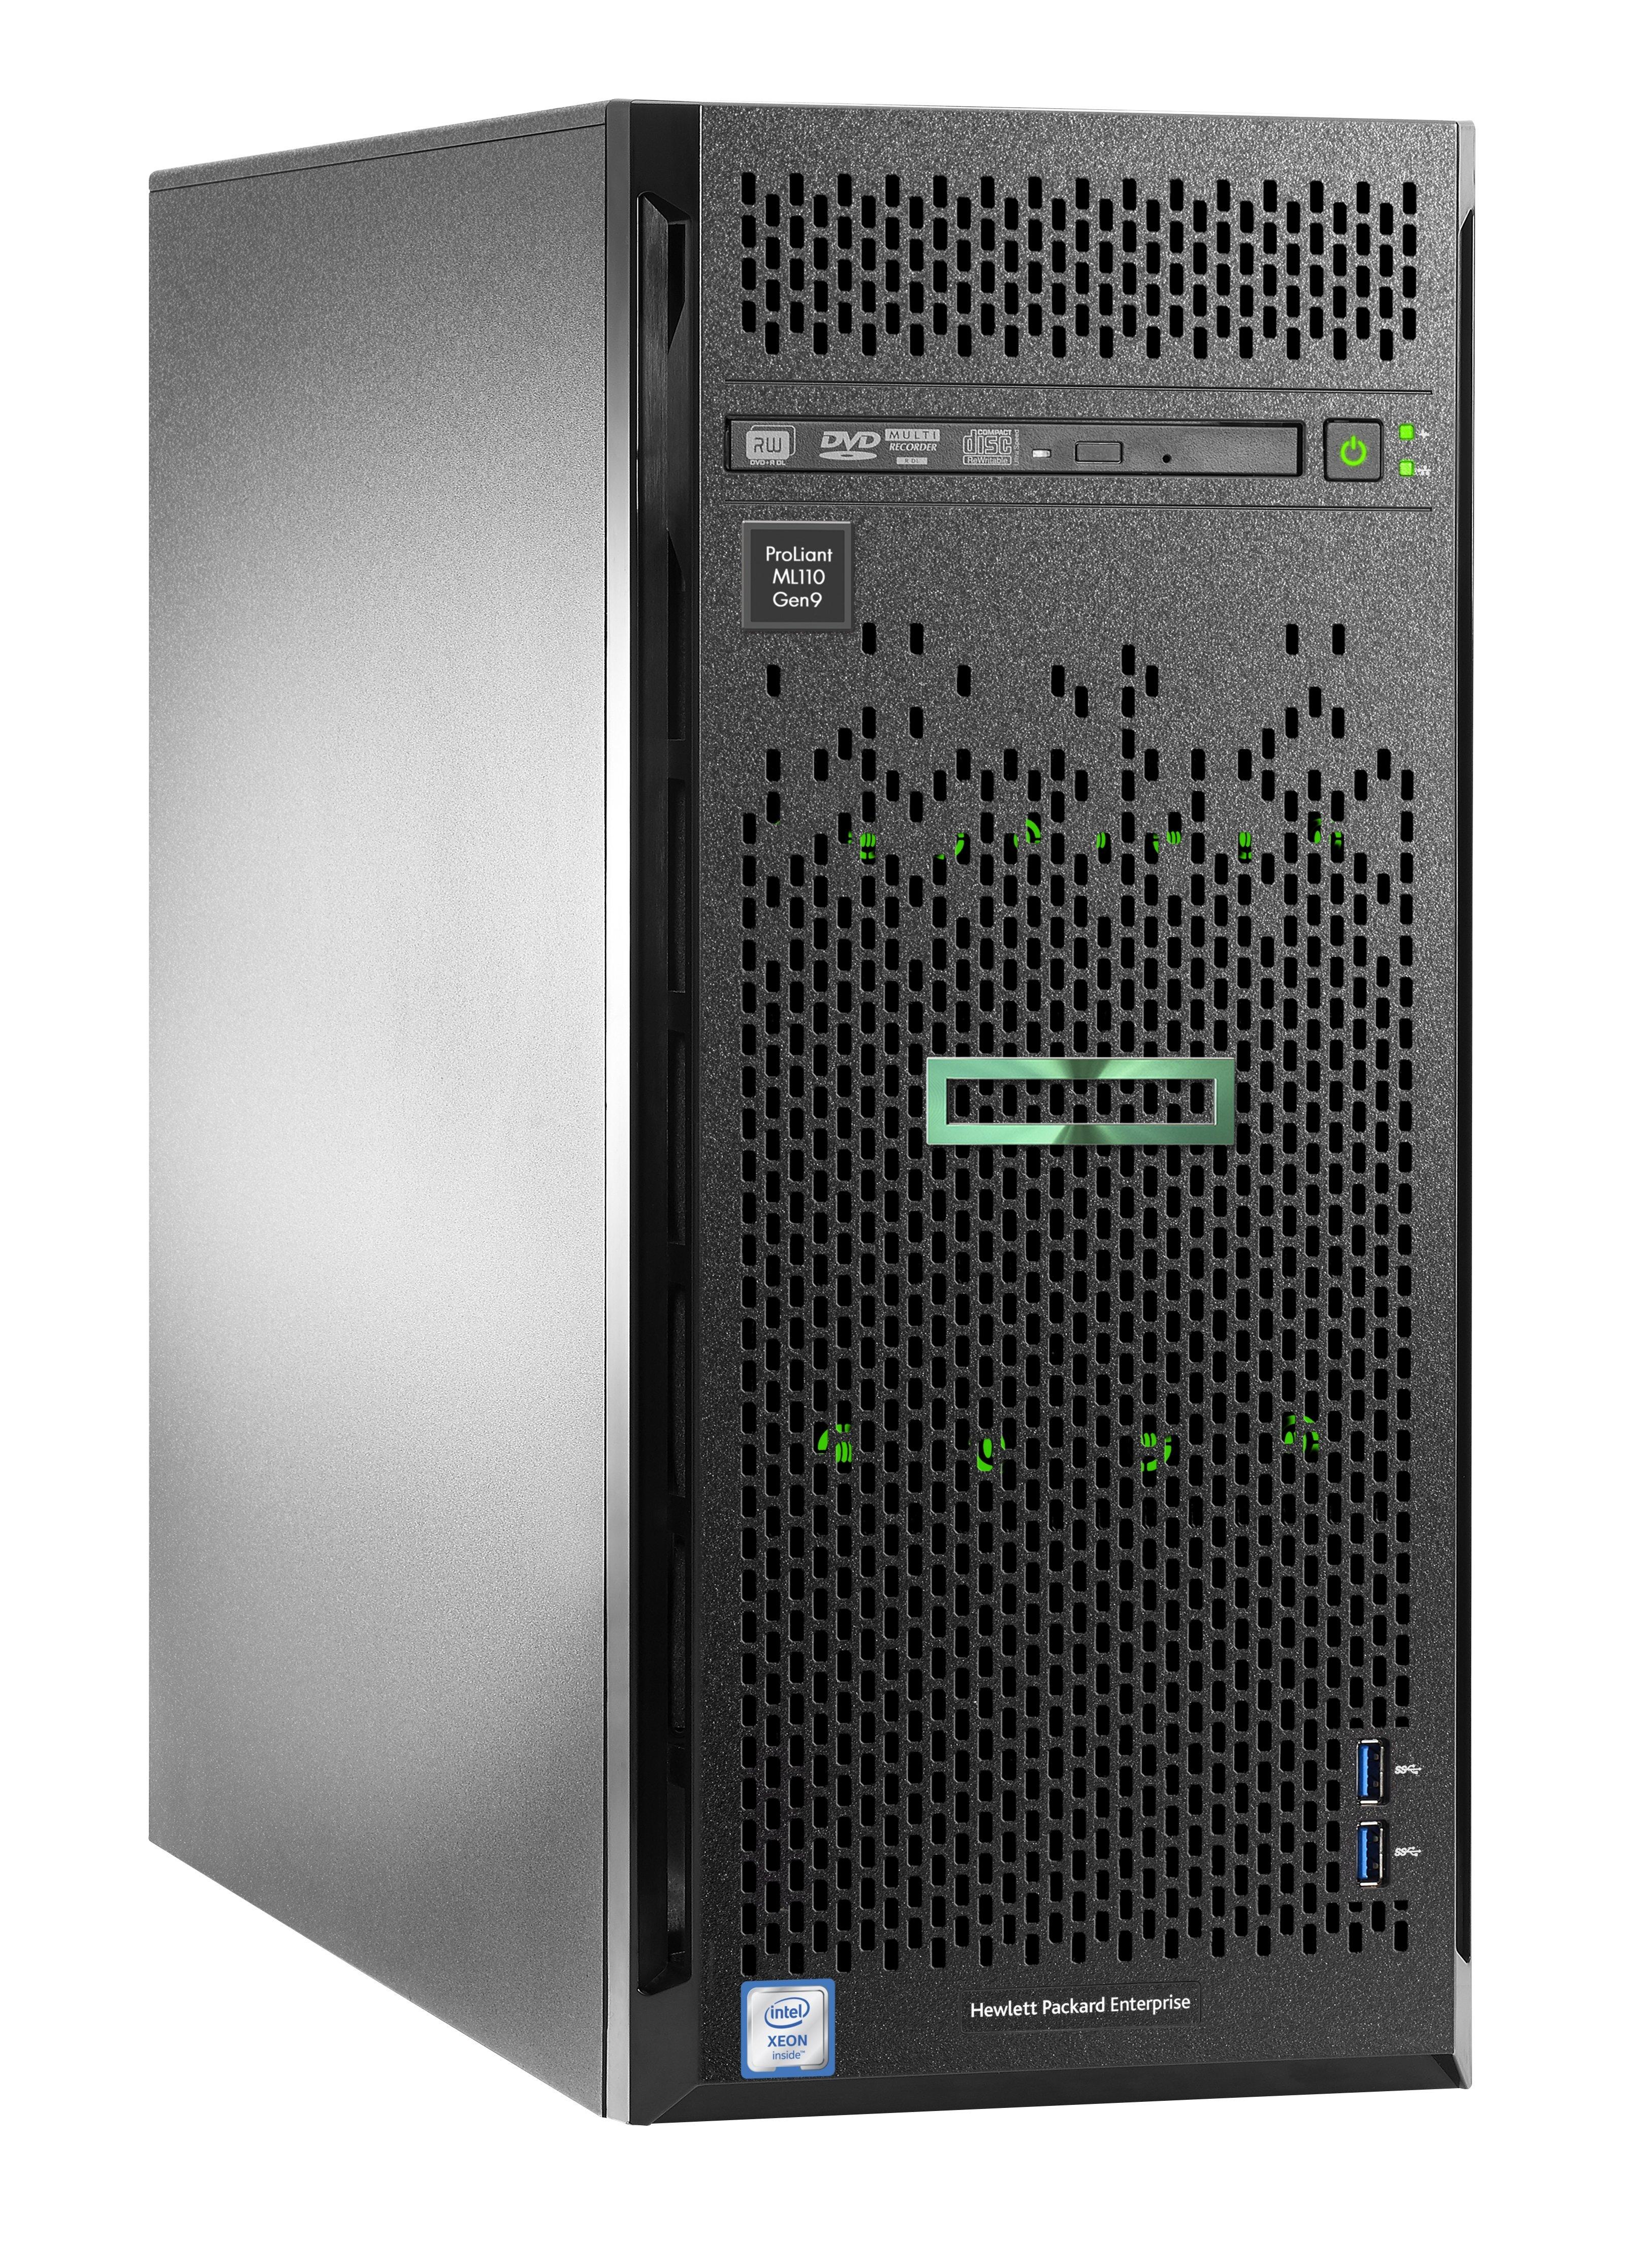 HPE ProLiant ML110 Gen9 - tower - Xeon E5-2603V4 1 7 GHz - 8 GB - 1 TB